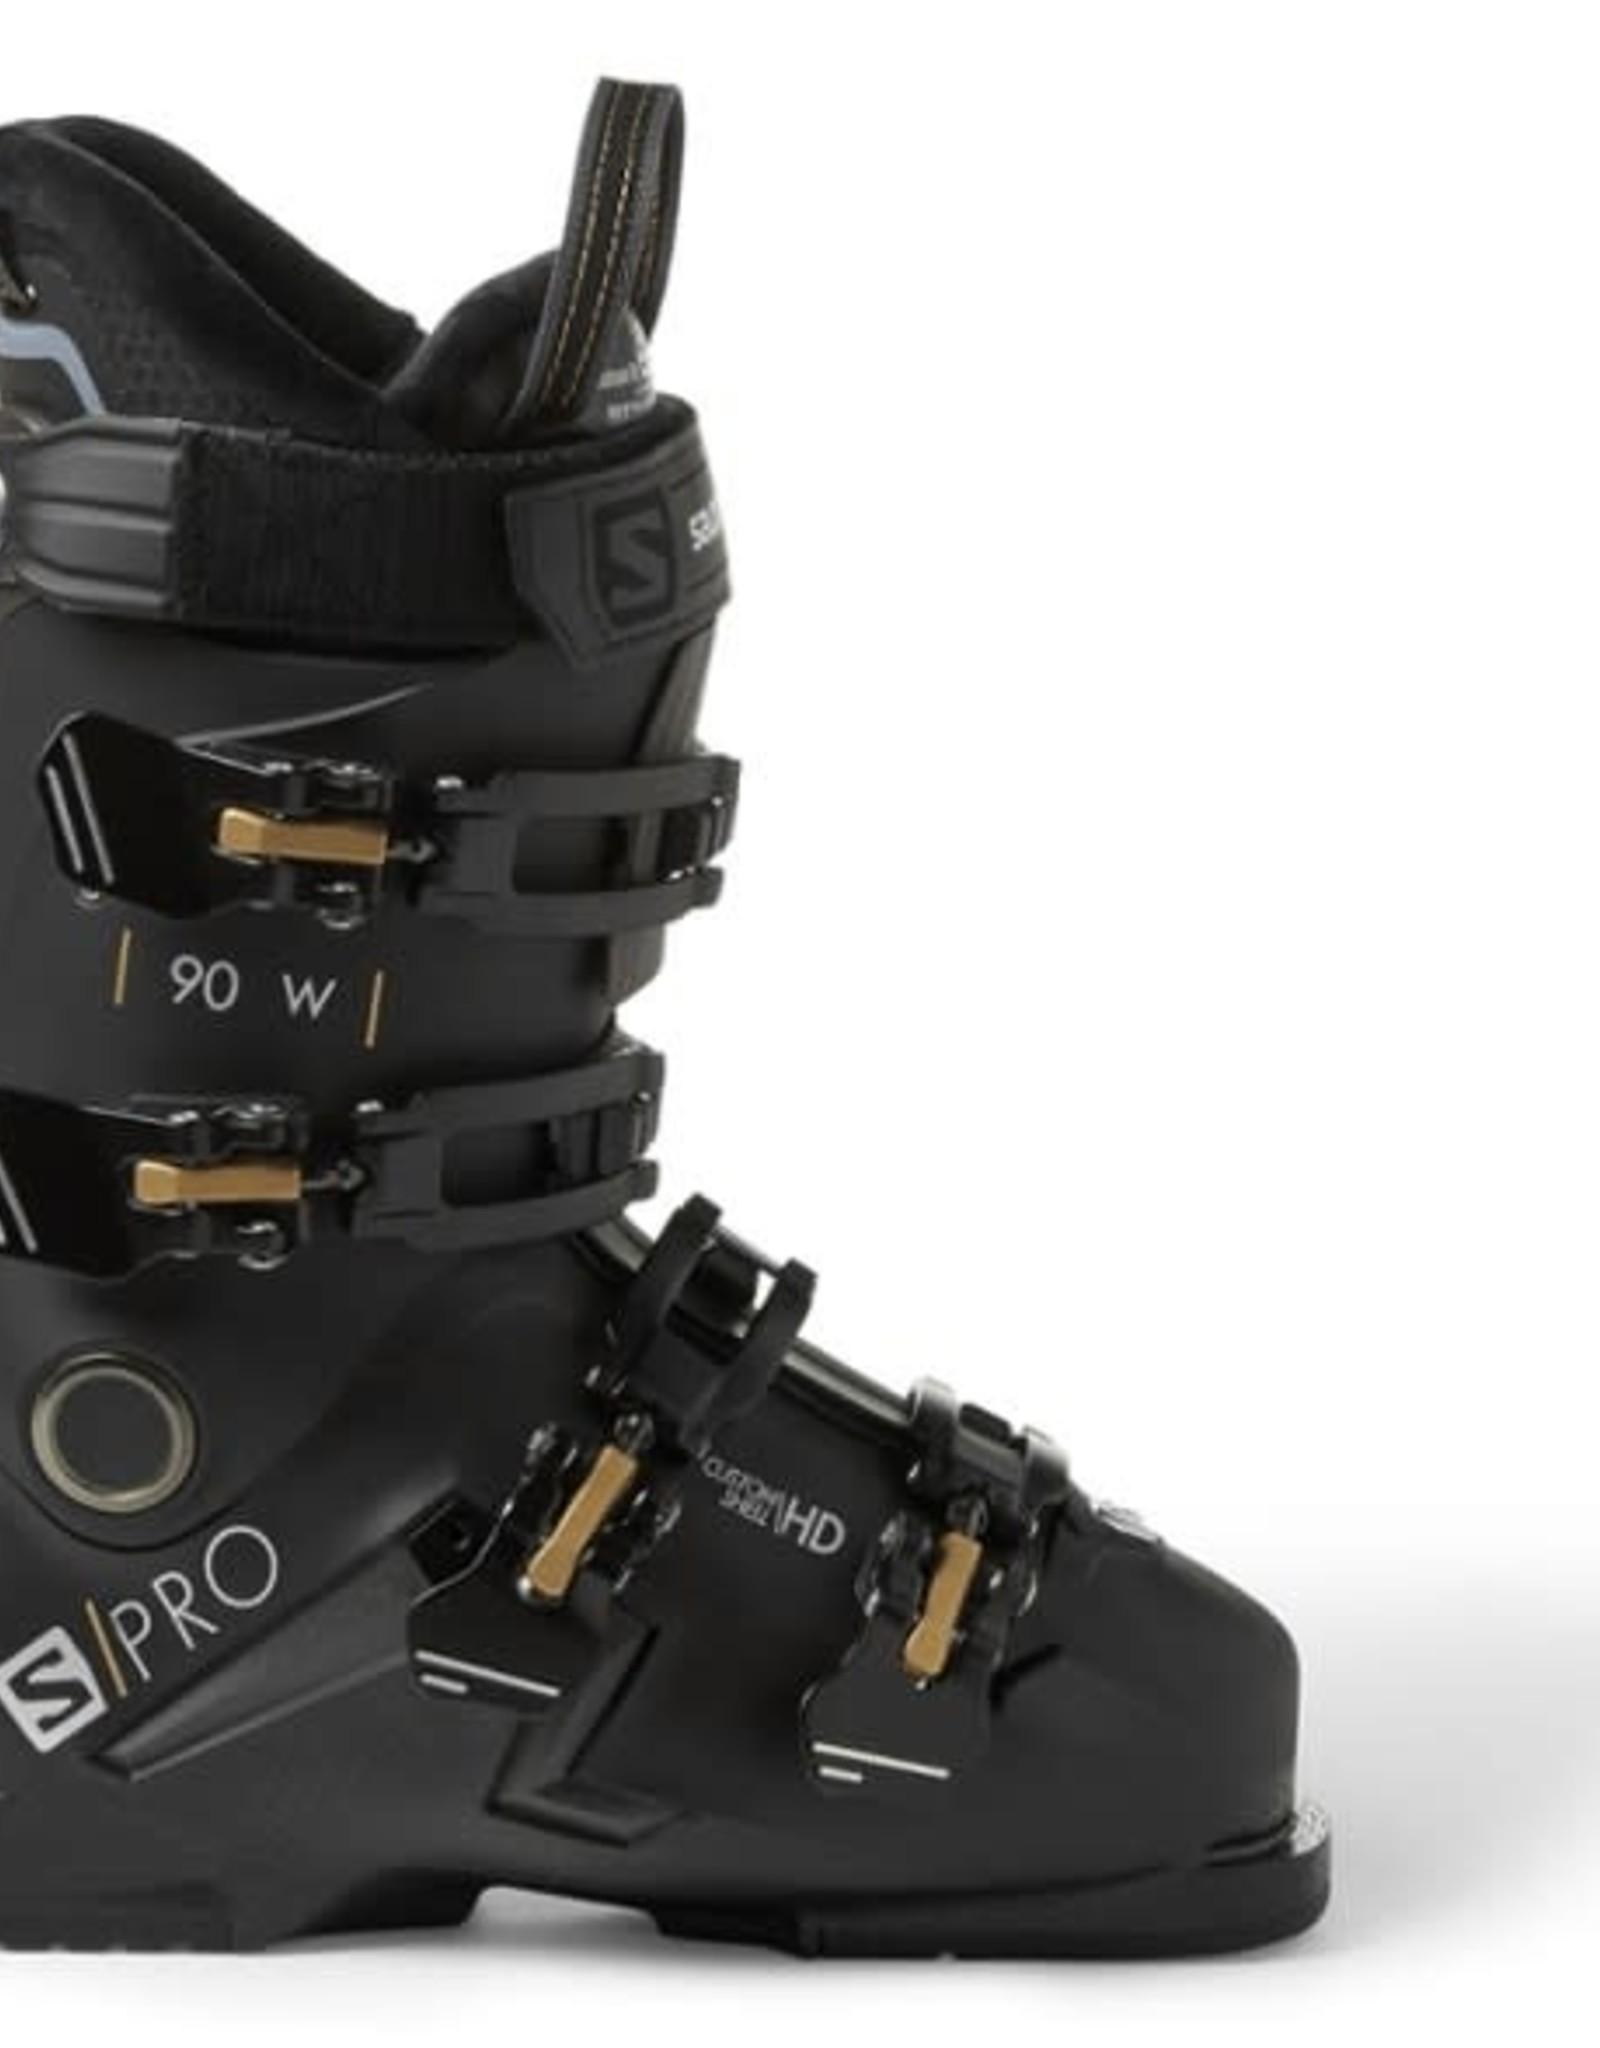 Salomon SALOMON Ski Boots S/PRO 90 W